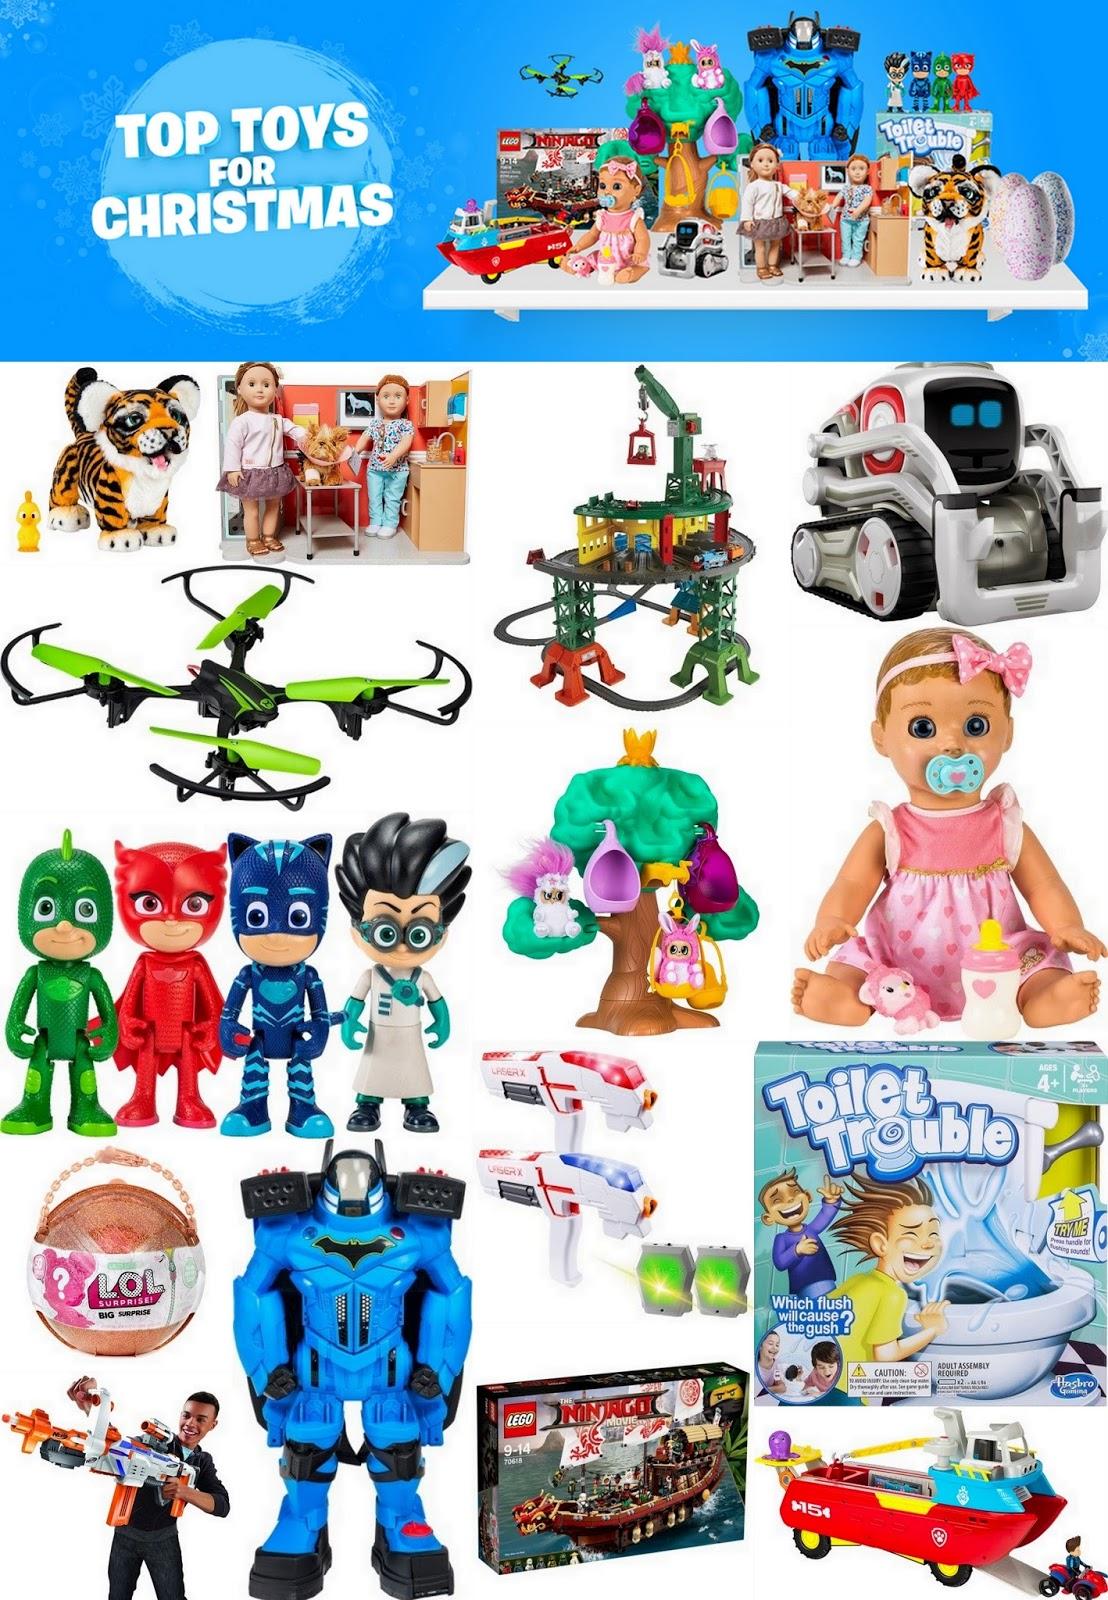 The Brick Castle: Smyths Toys Top Toys For Christmas 2017